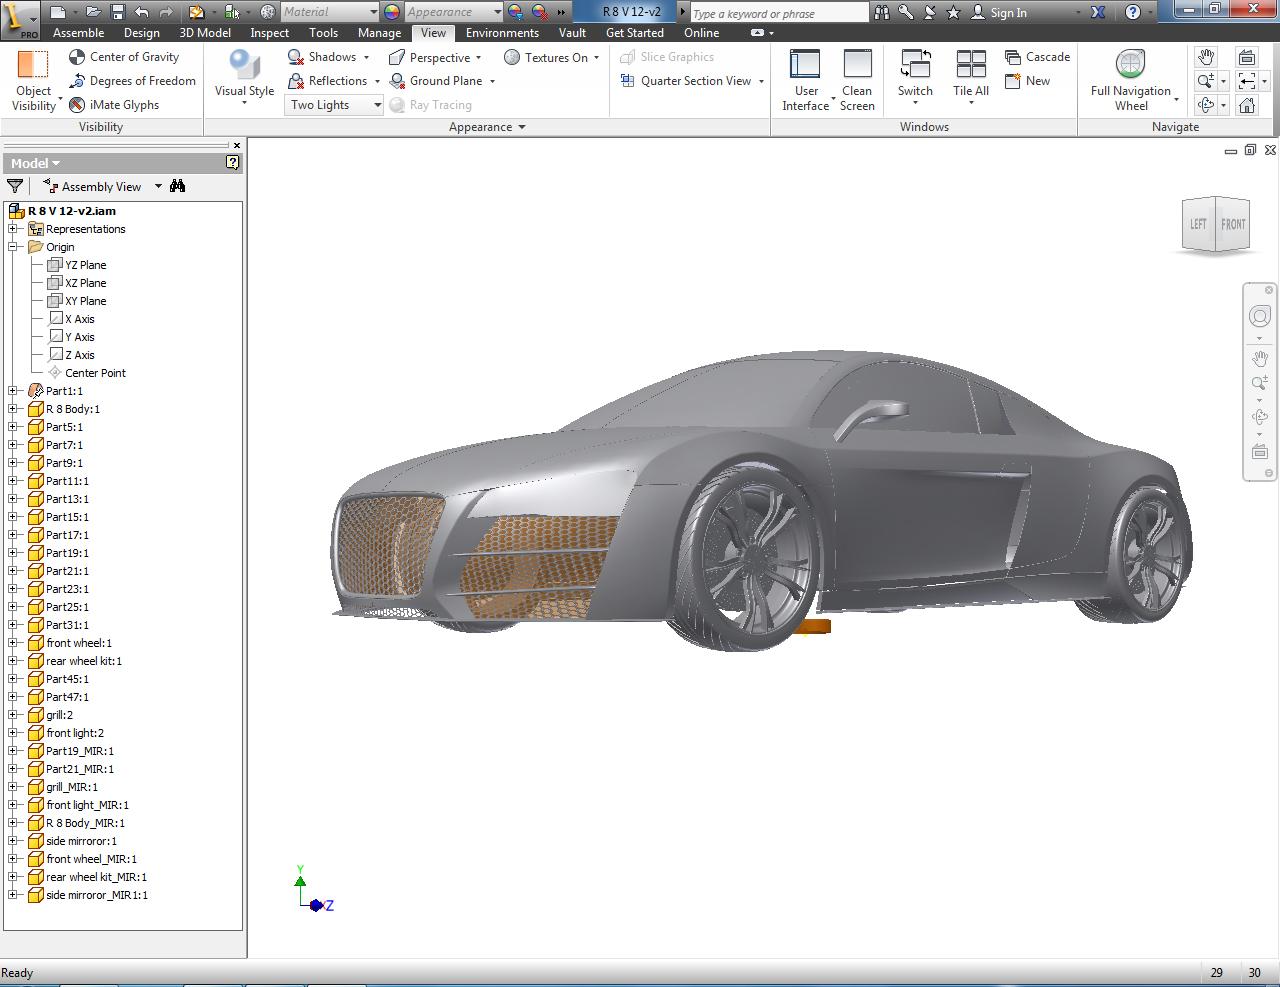 Autodesk Inventor Carmodeling - Autodesk Community- Inventor